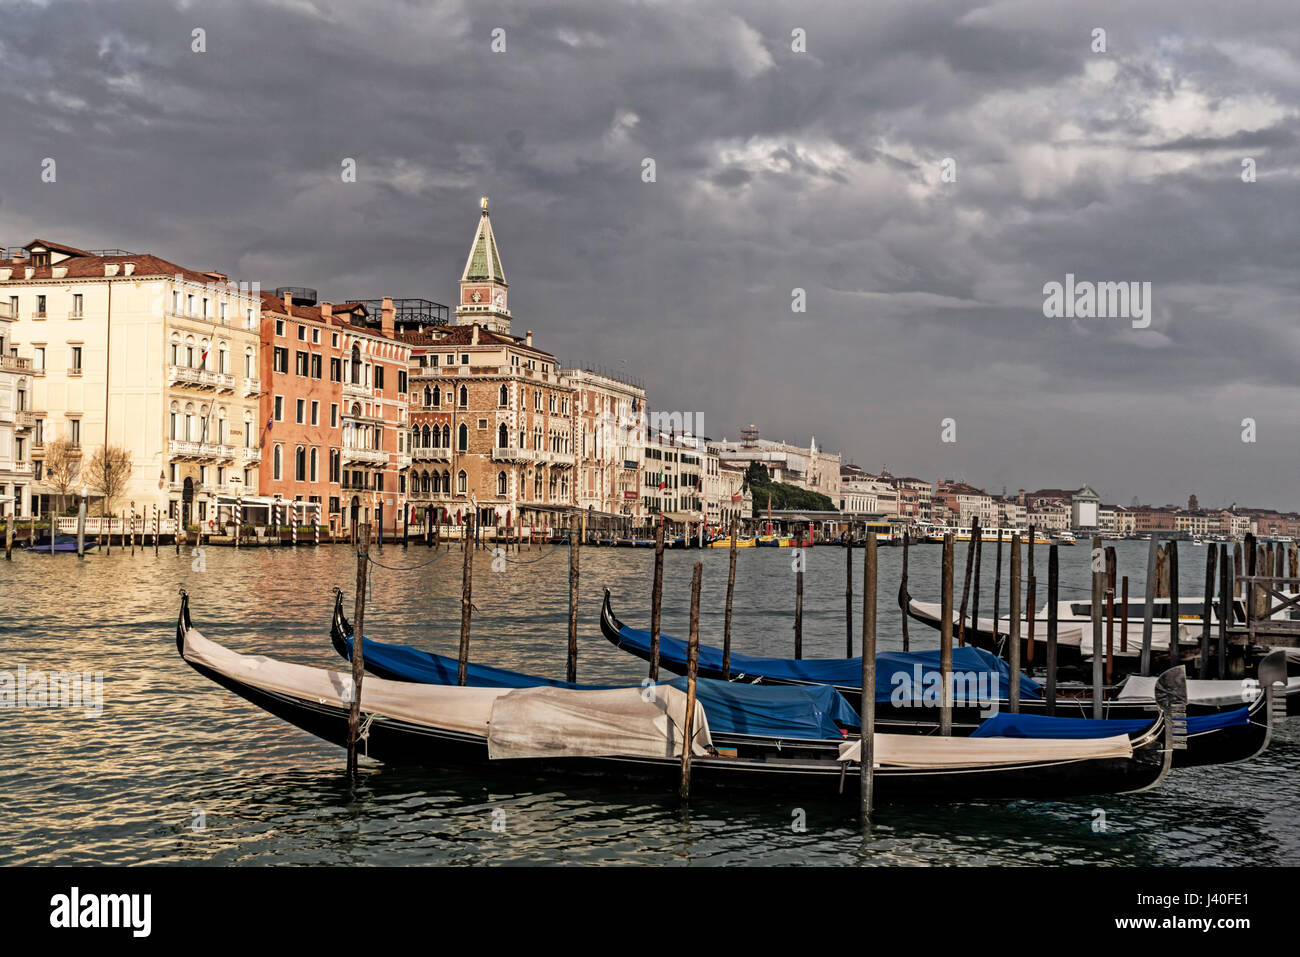 Canale Grande, Gondola, background Campanile, Venice Italy - Stock Image